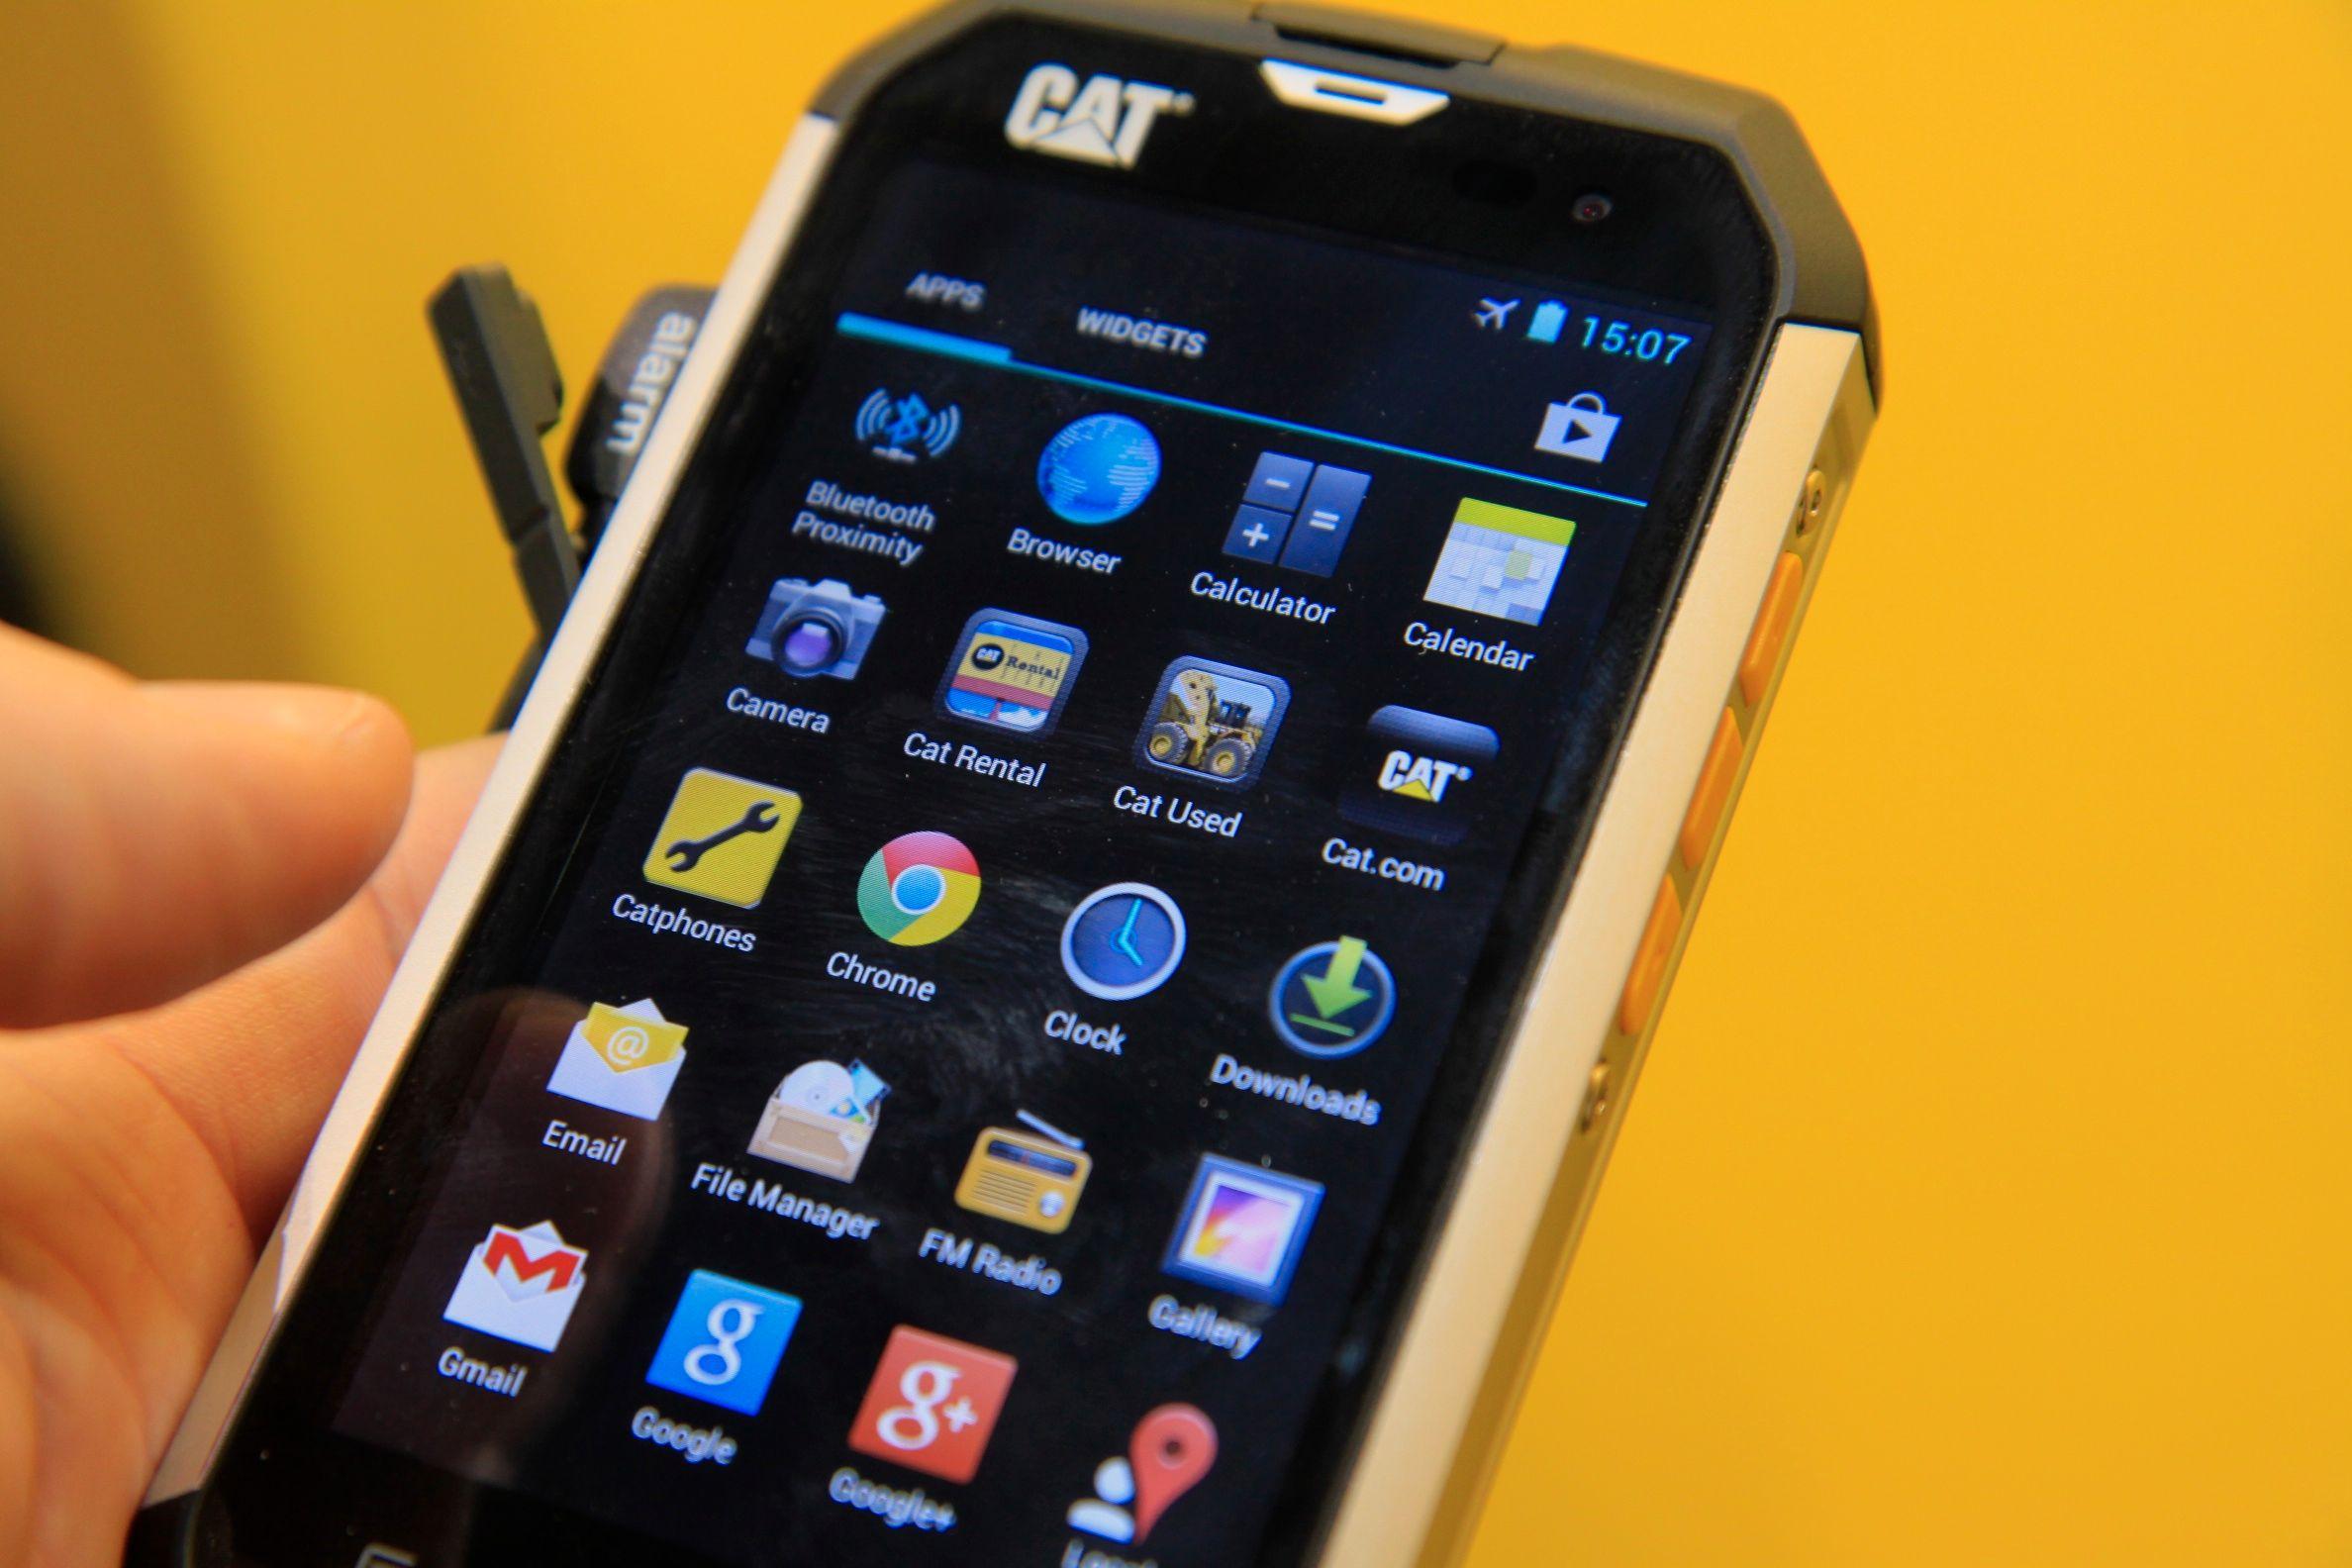 Operativsystemet er Android 4.1 Jelly Bean.Foto: Kurt Lekanger, Amobil.no